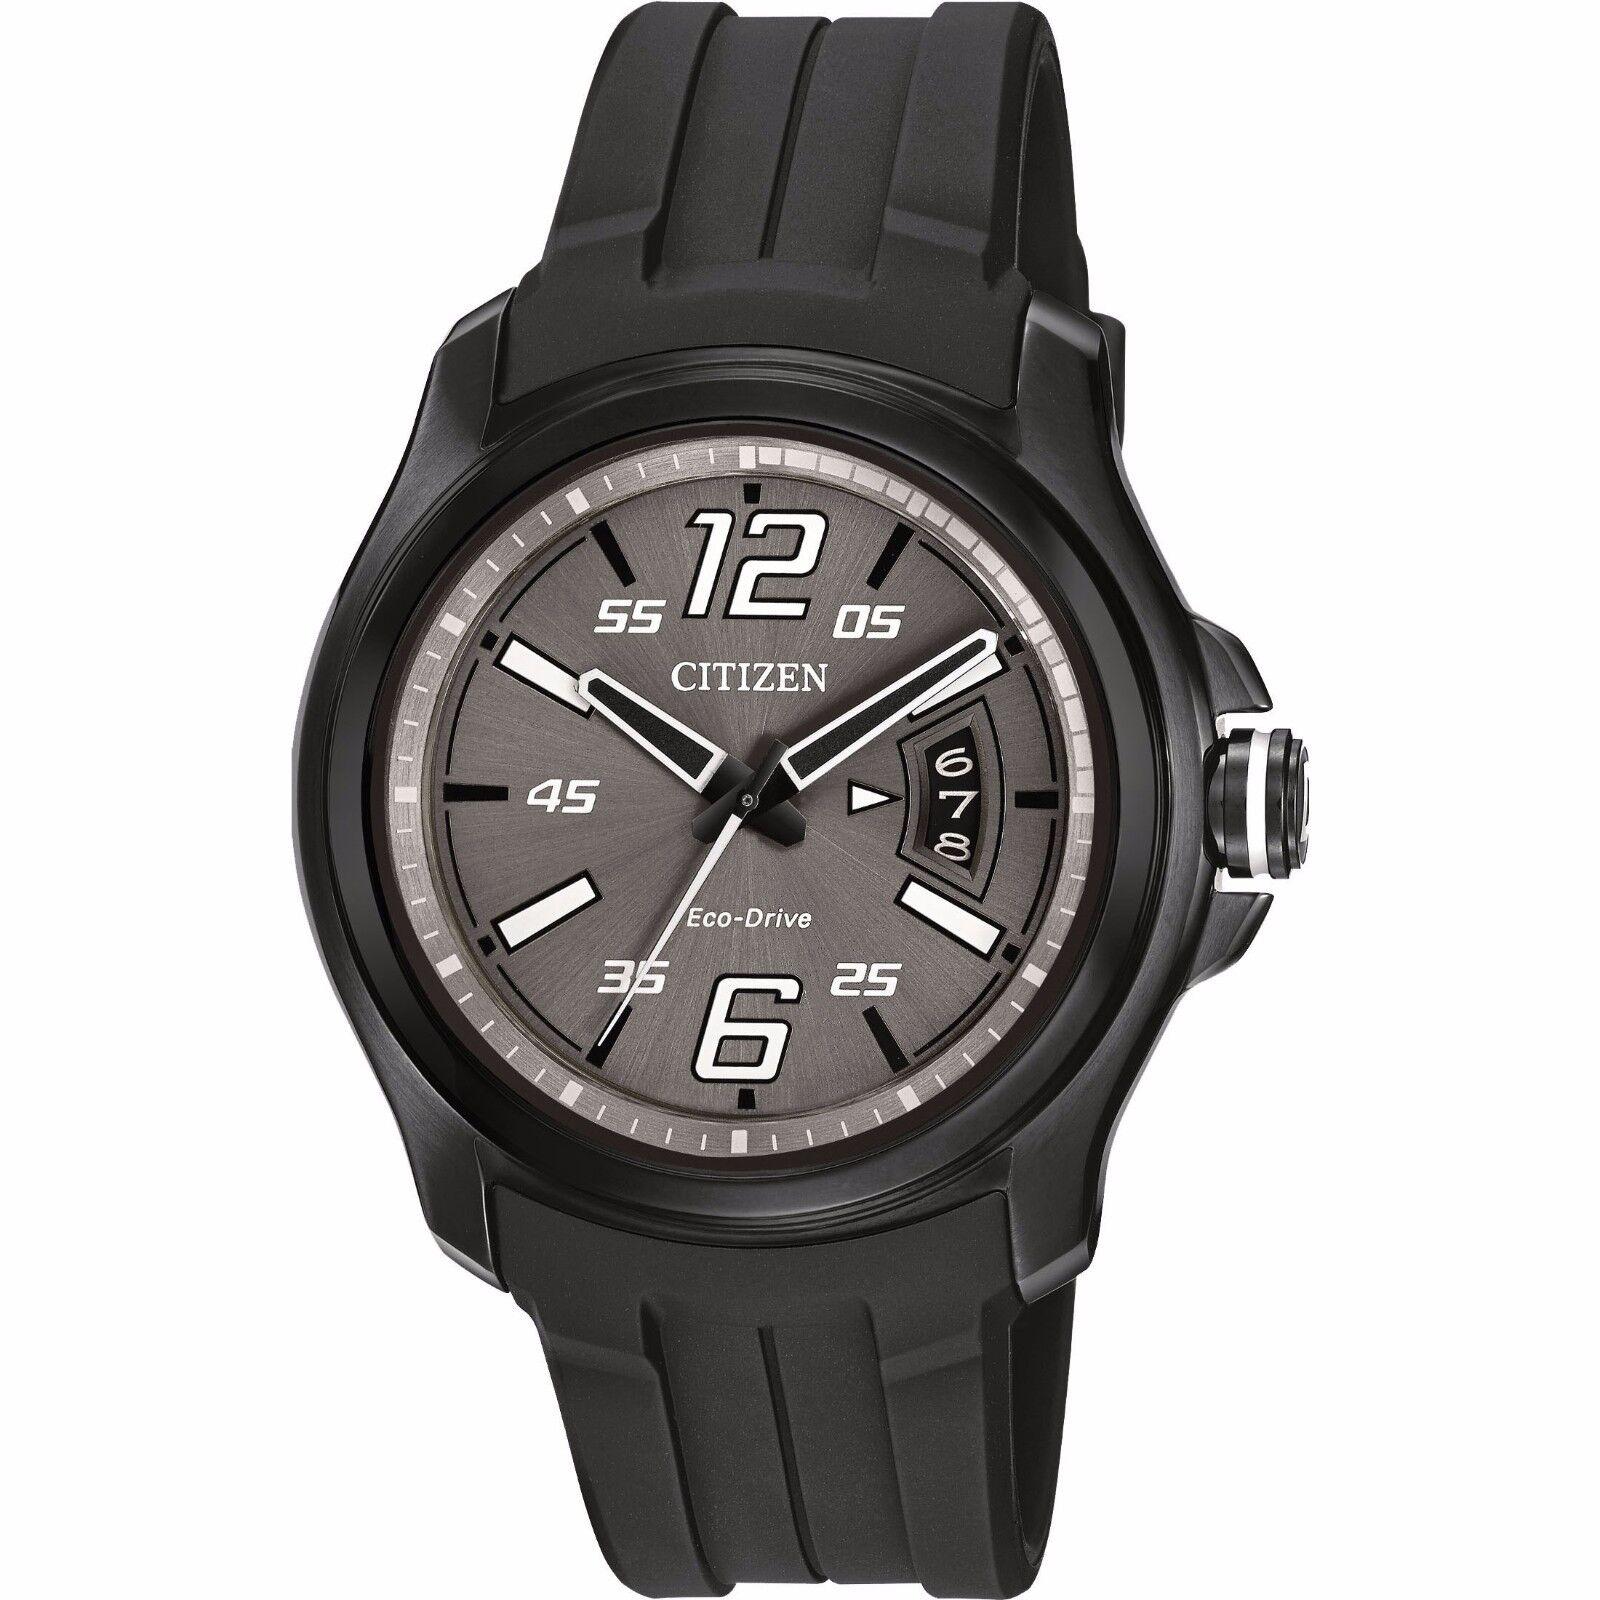 $87.99 - Citizen Eco-Drive Men's AW1354-15H Black Polyurethane Band Watch